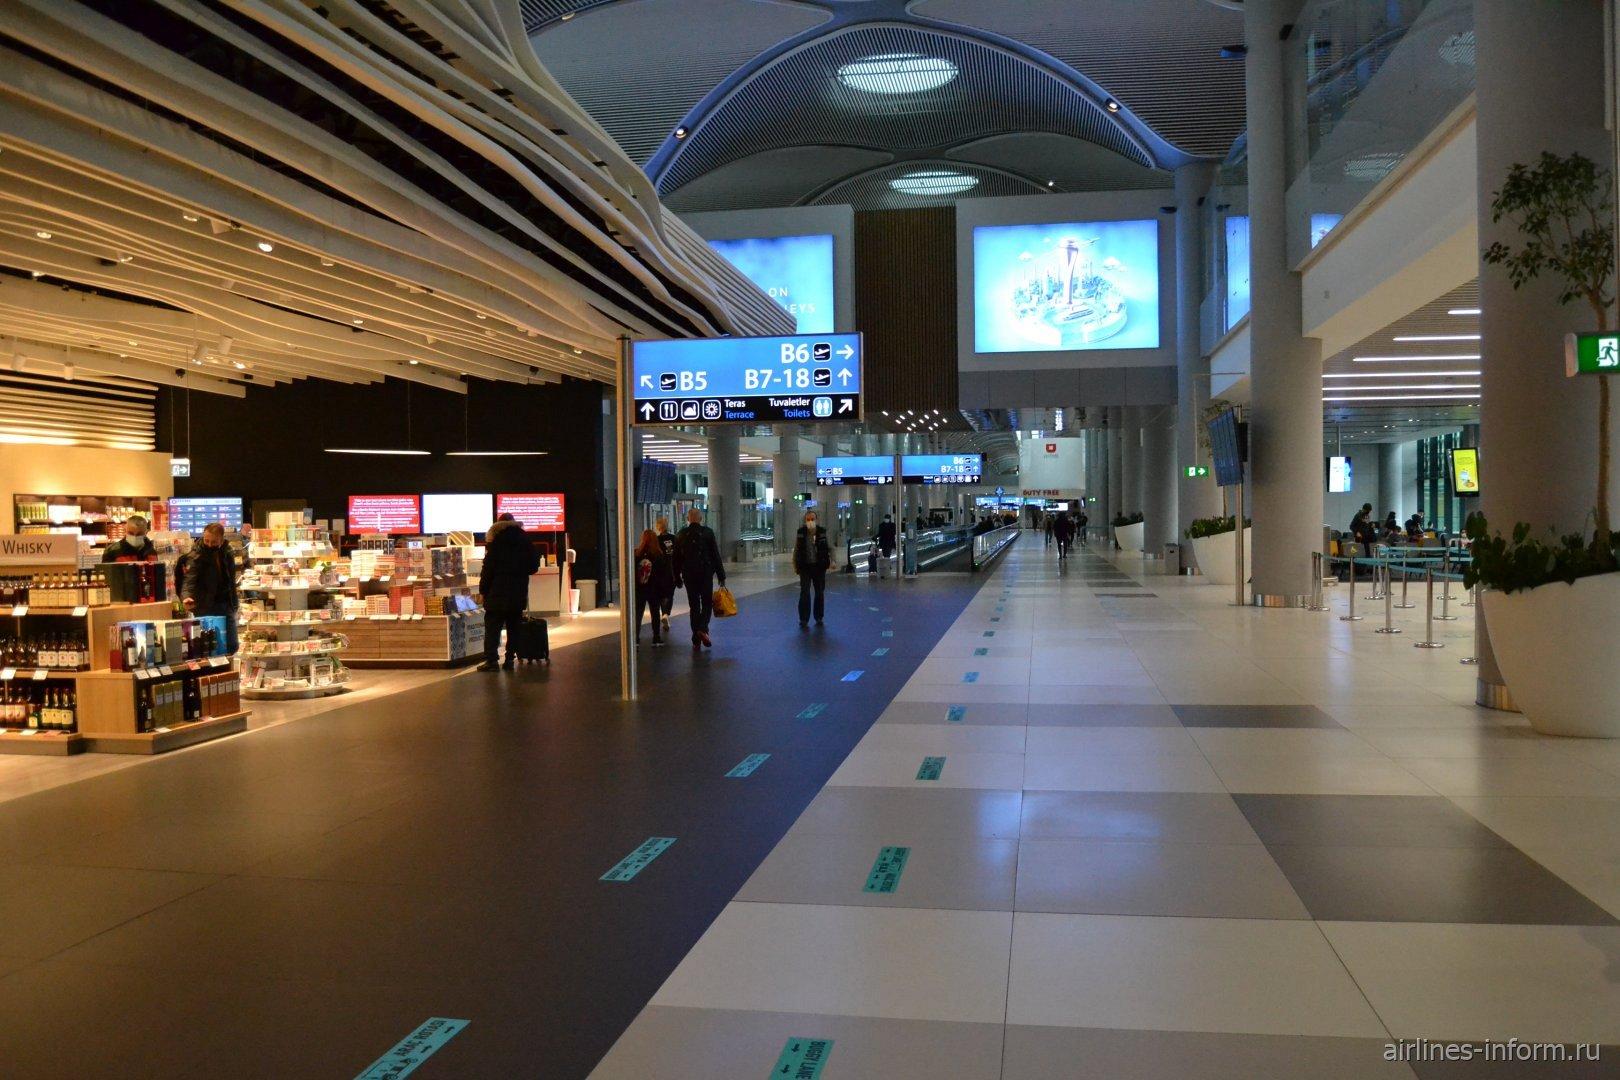 В конкорсе B пассажирского терминала аэропорта Стамбул Новый